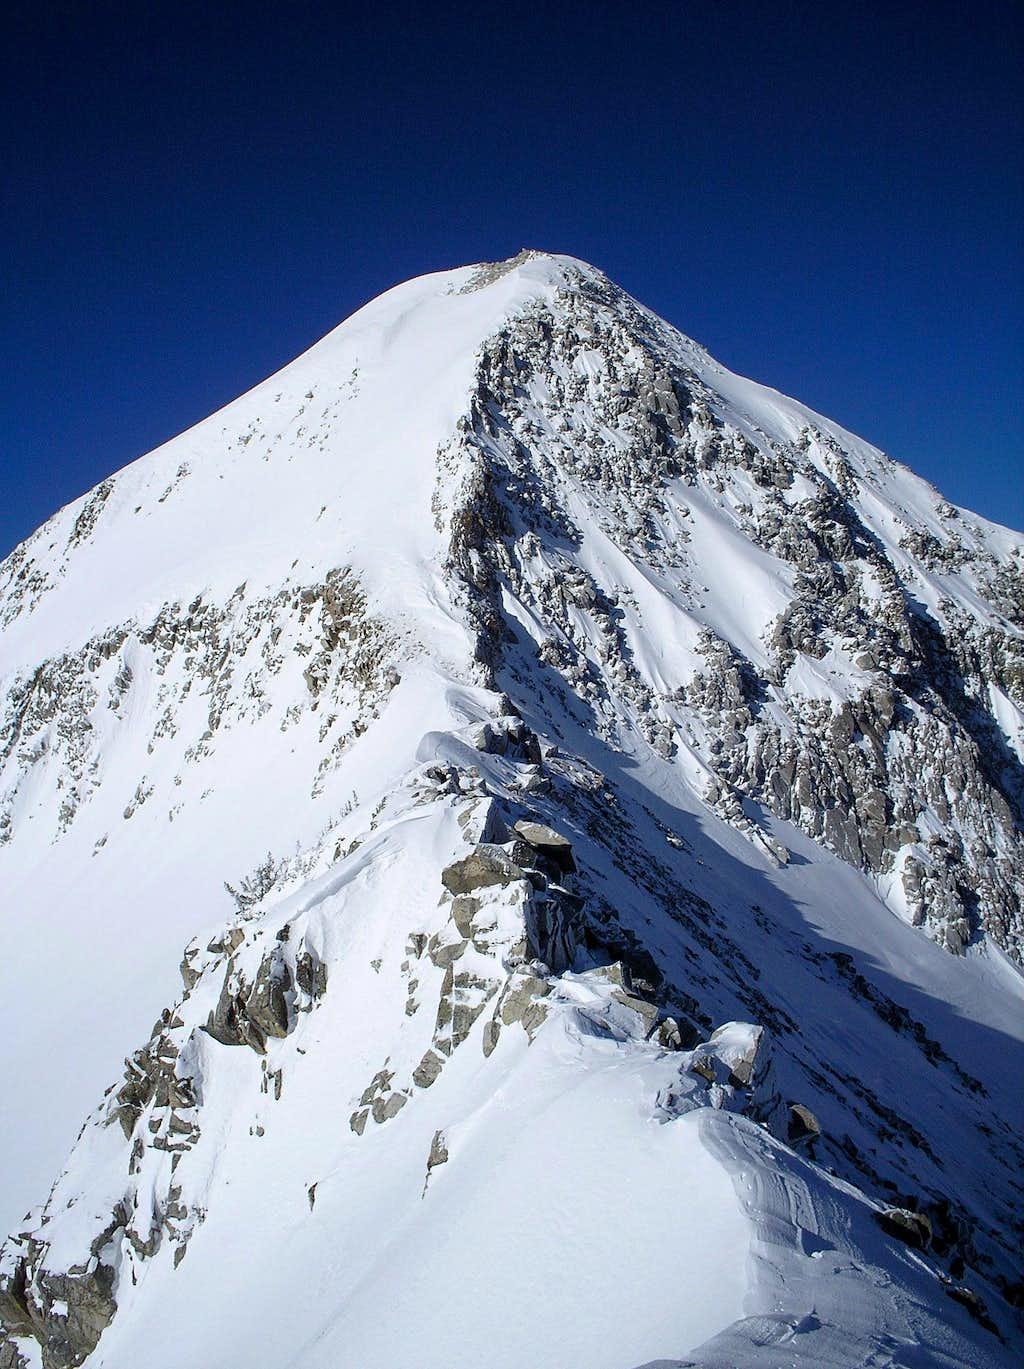 The Ridge and Peak